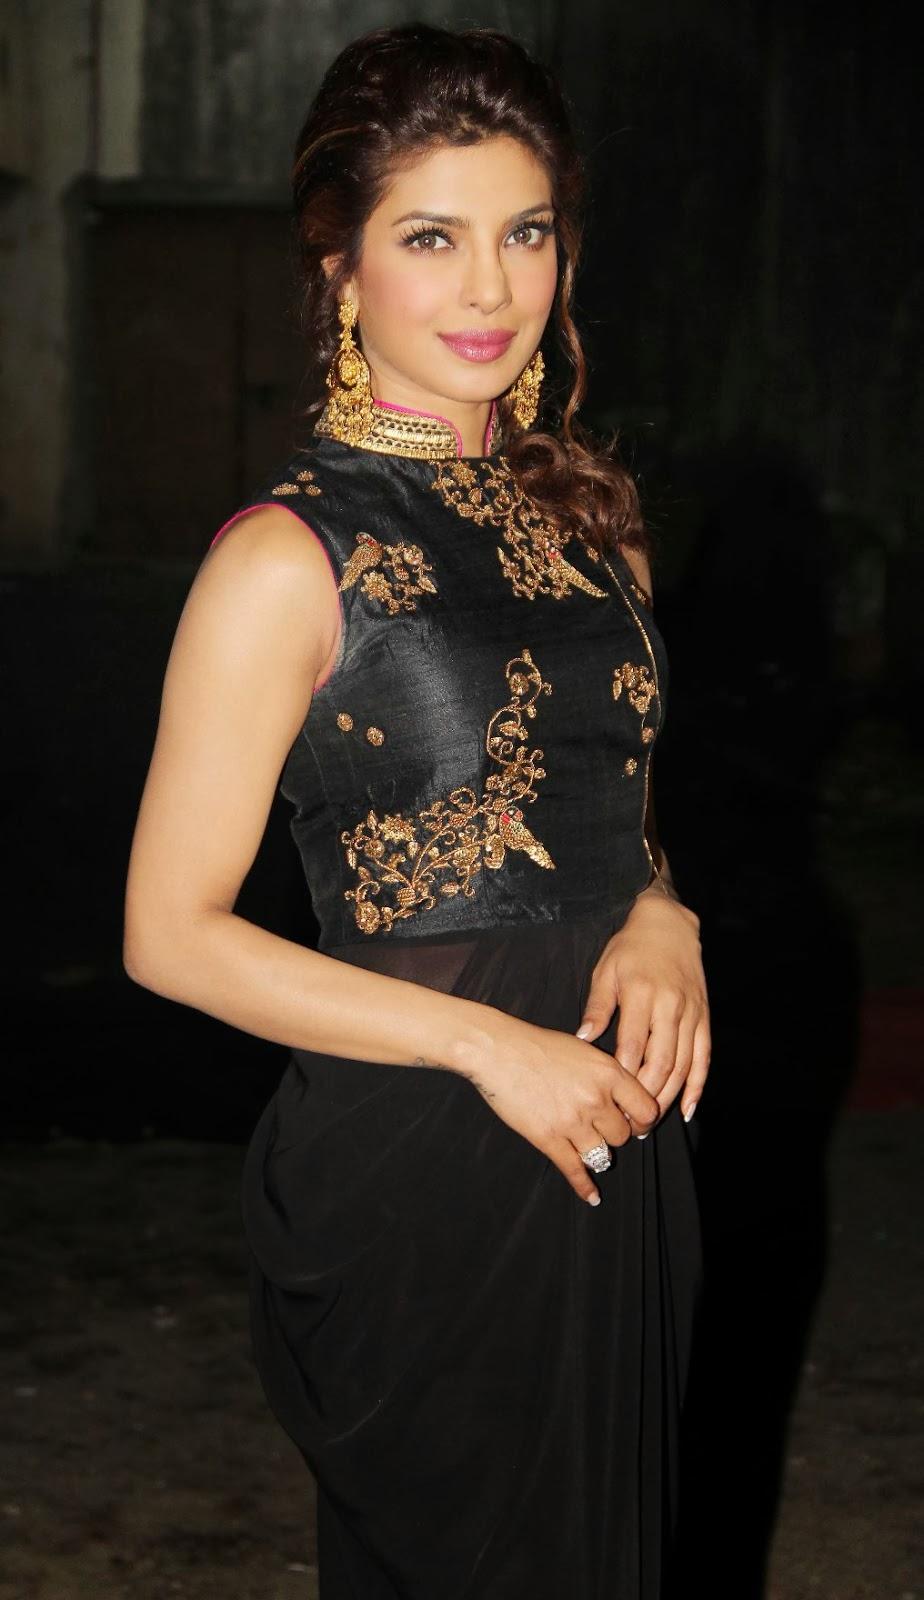 Priyanka Chopra Latest Wallpapers In Black Dress -4488